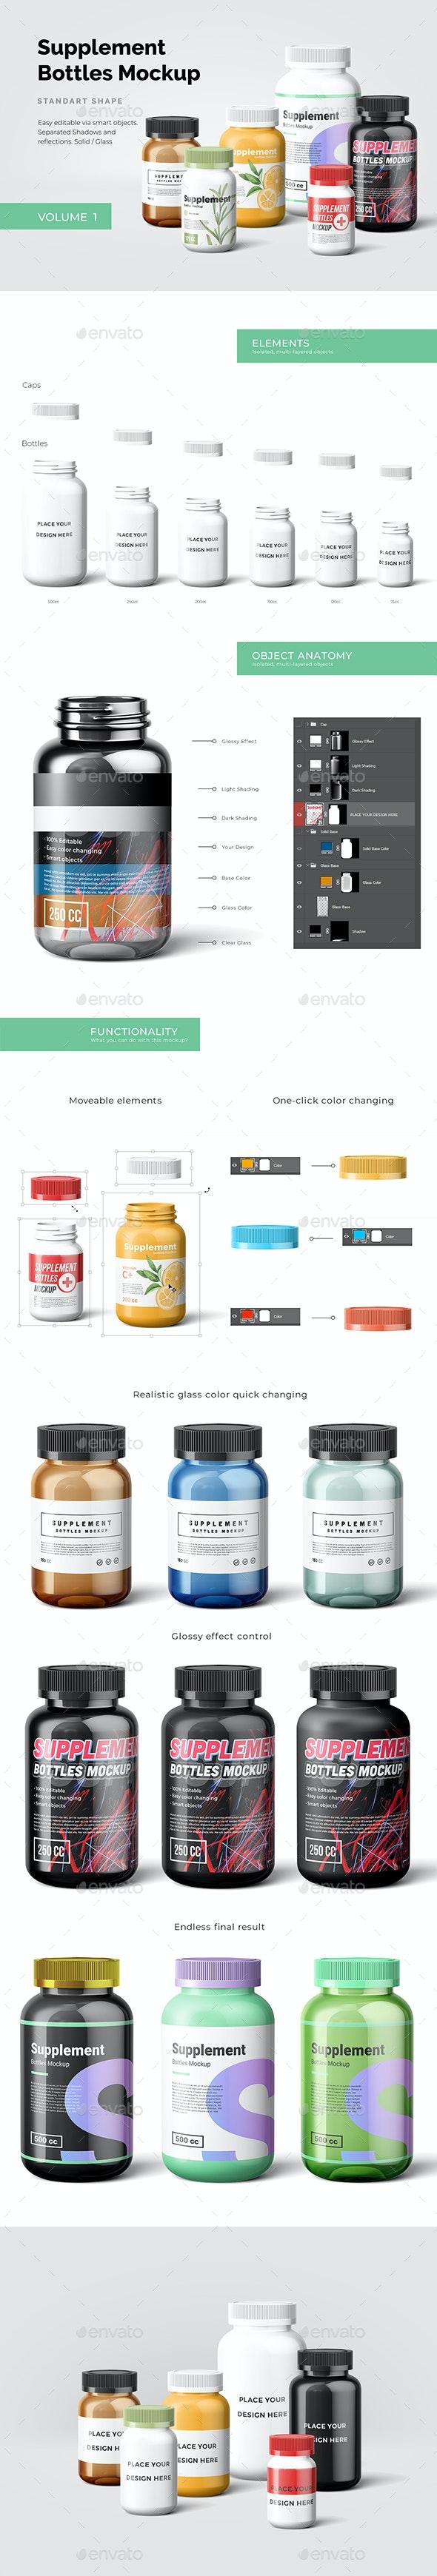 Supplement Bottles Mockup - Beauty Packaging